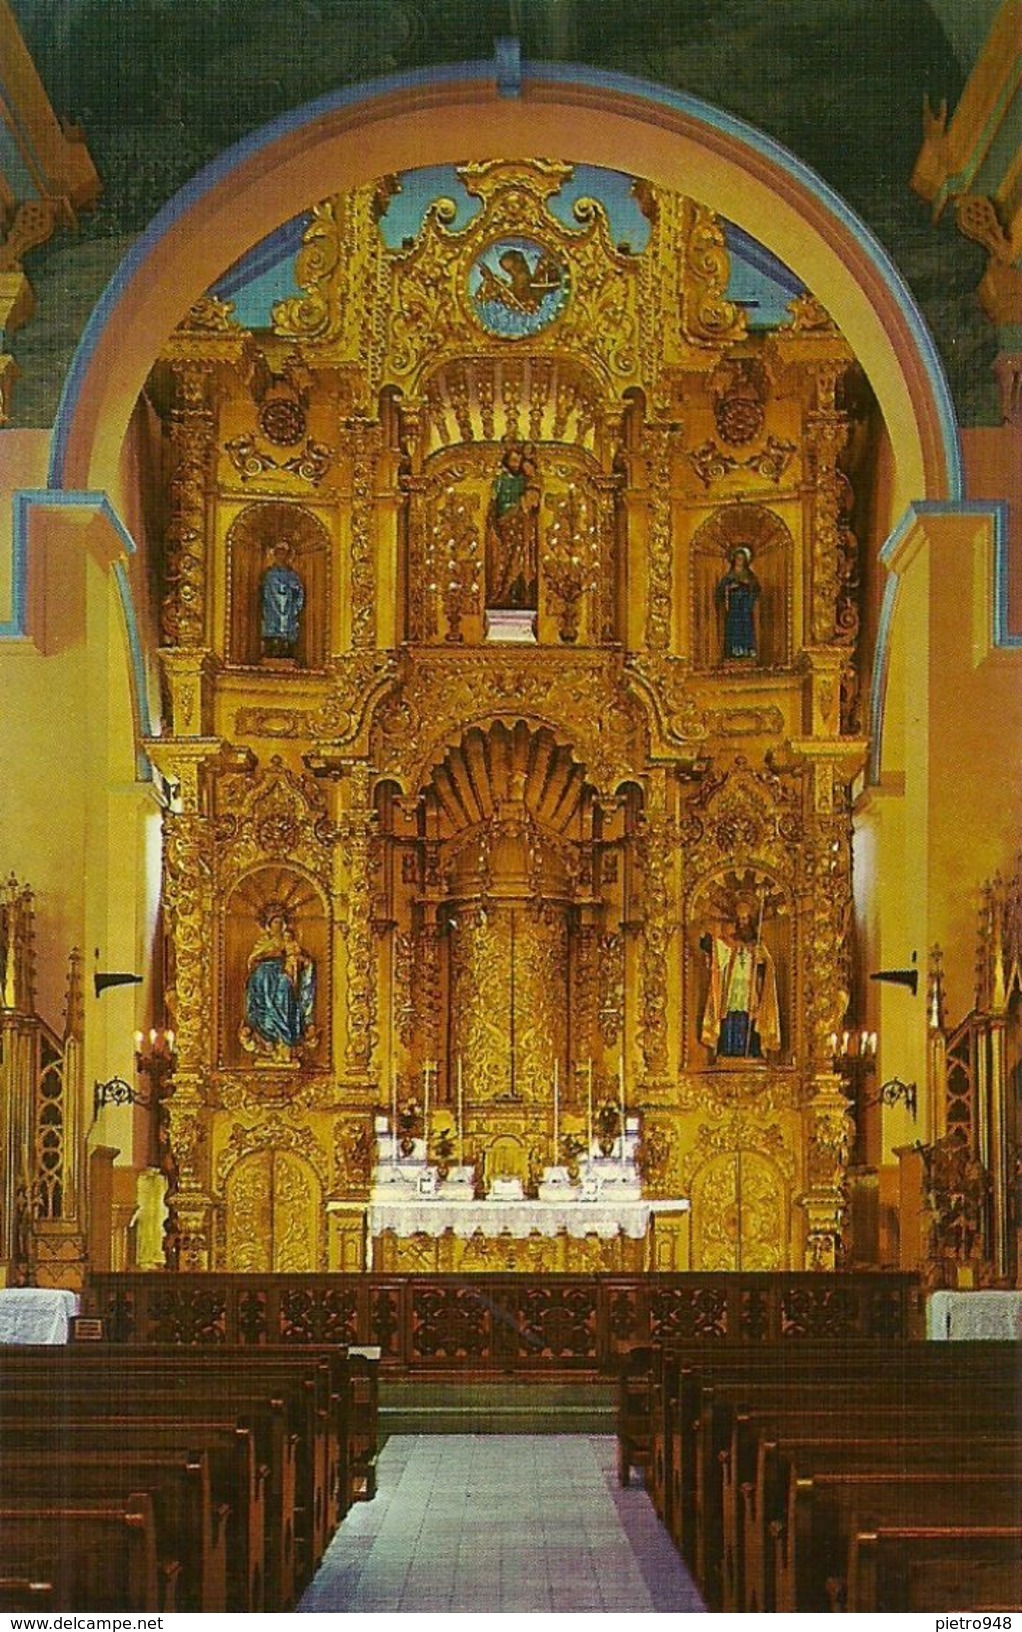 Republica De Panama, Panama, Iglesia De San José, El Altar De Oro - The Church Of San José, The Golden Altar - Panama